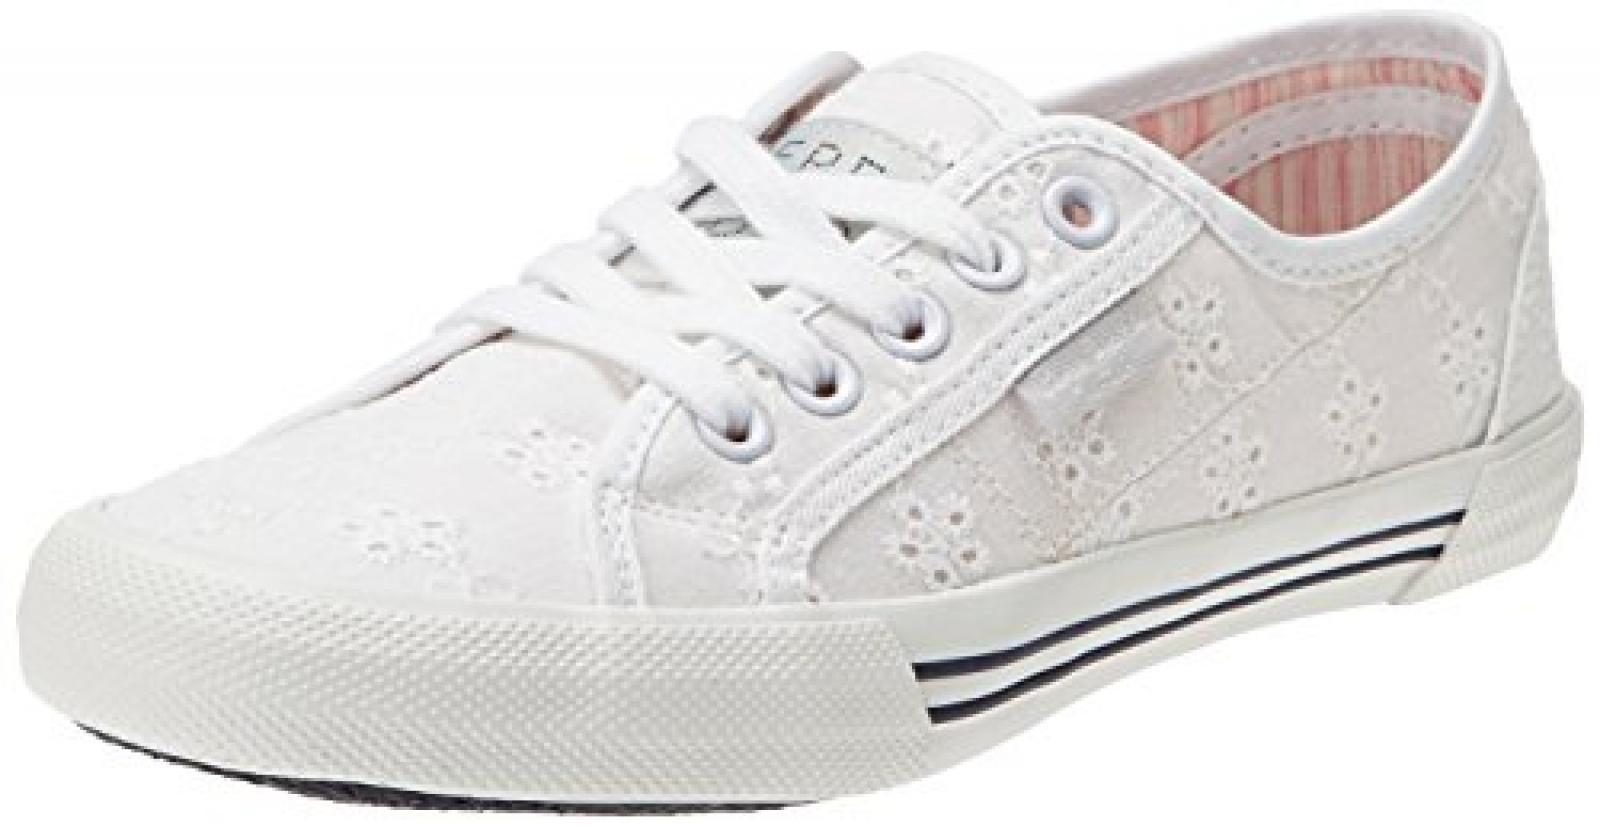 Pepe Jeans London ABERLADY ANGLAISE Damen Sneakers